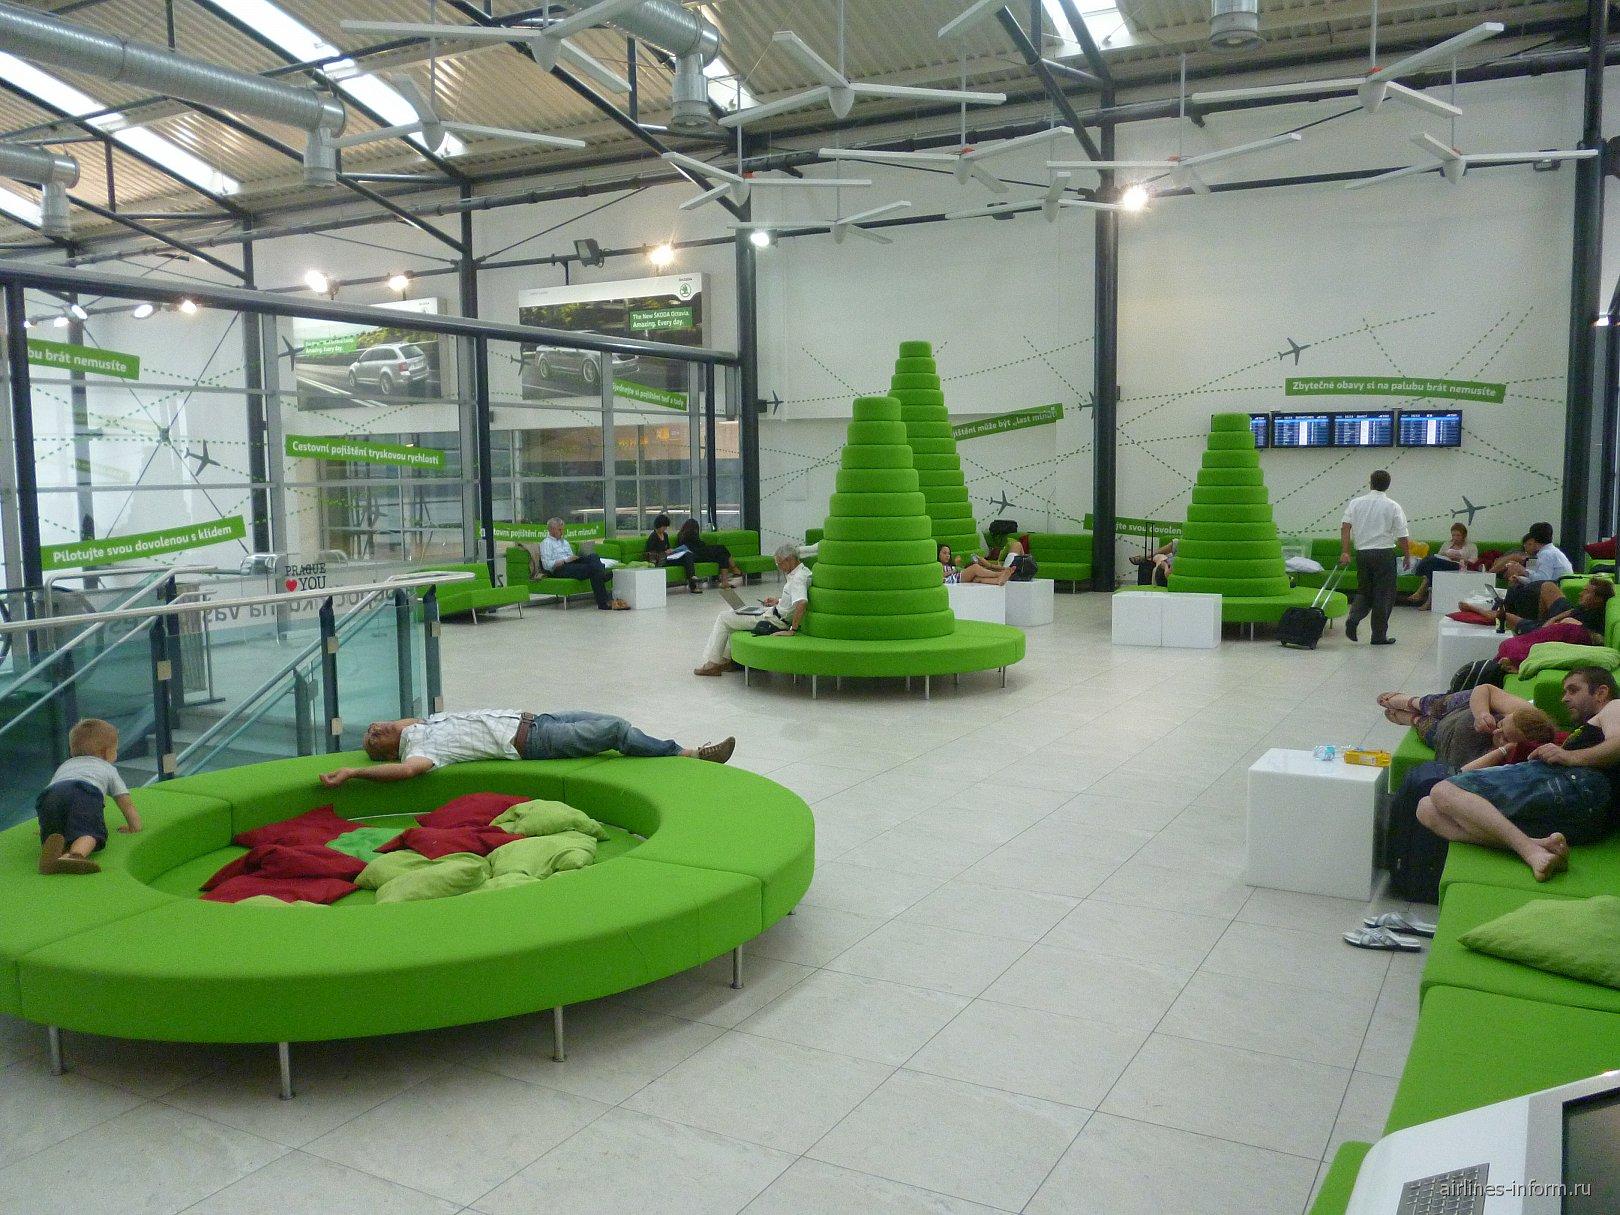 Комната релаксации между зонами C и D терминала 2 аэропорта Праги